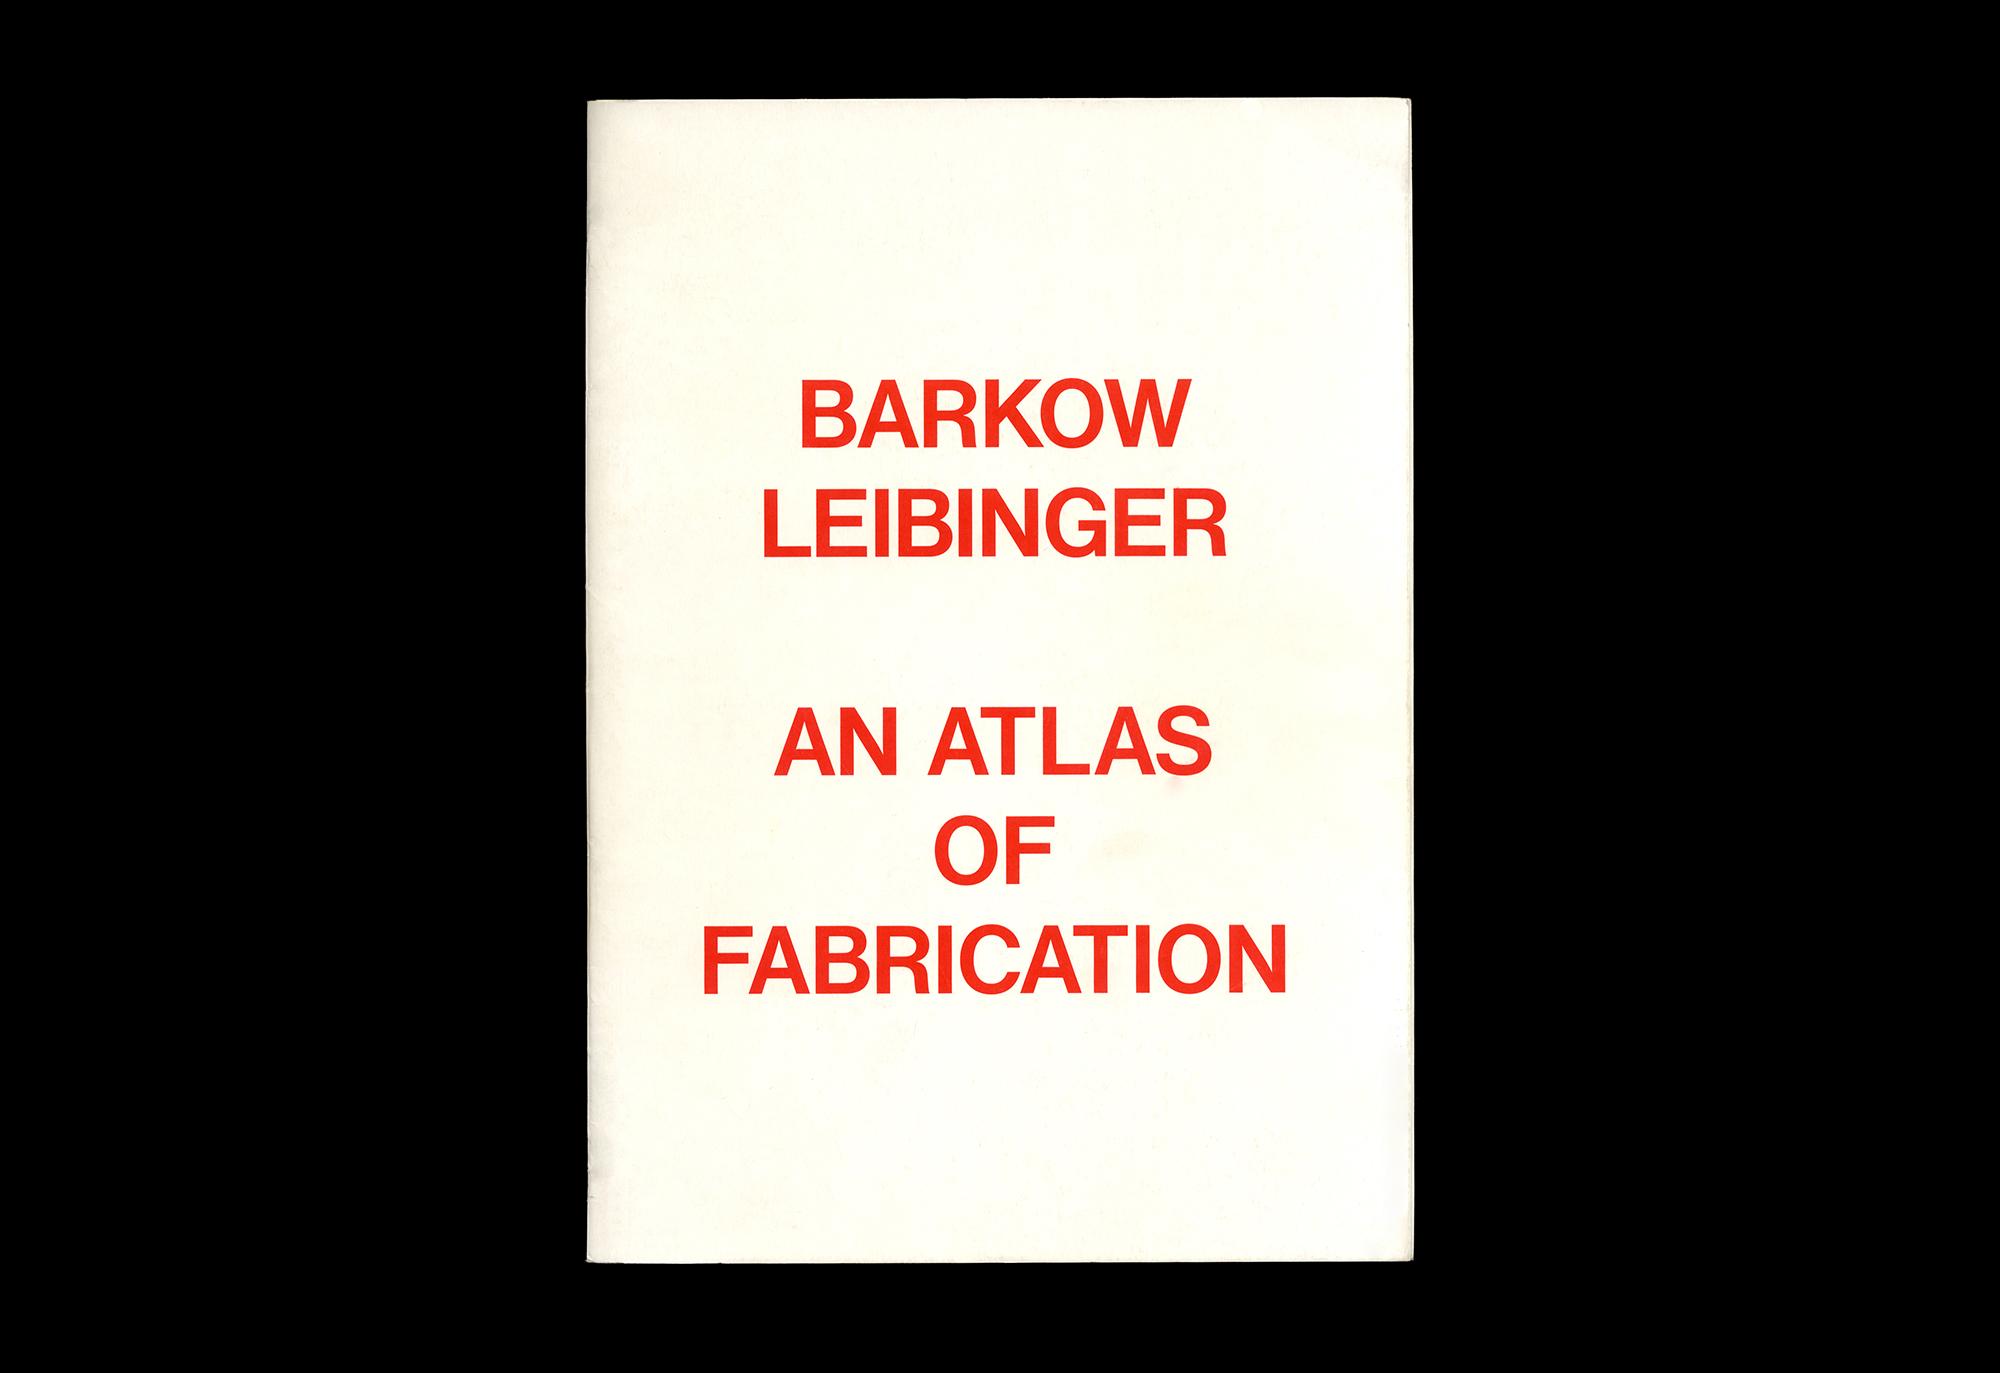 Cover image: Barkow Leibinger: An Atlas of Fabrication (2010)